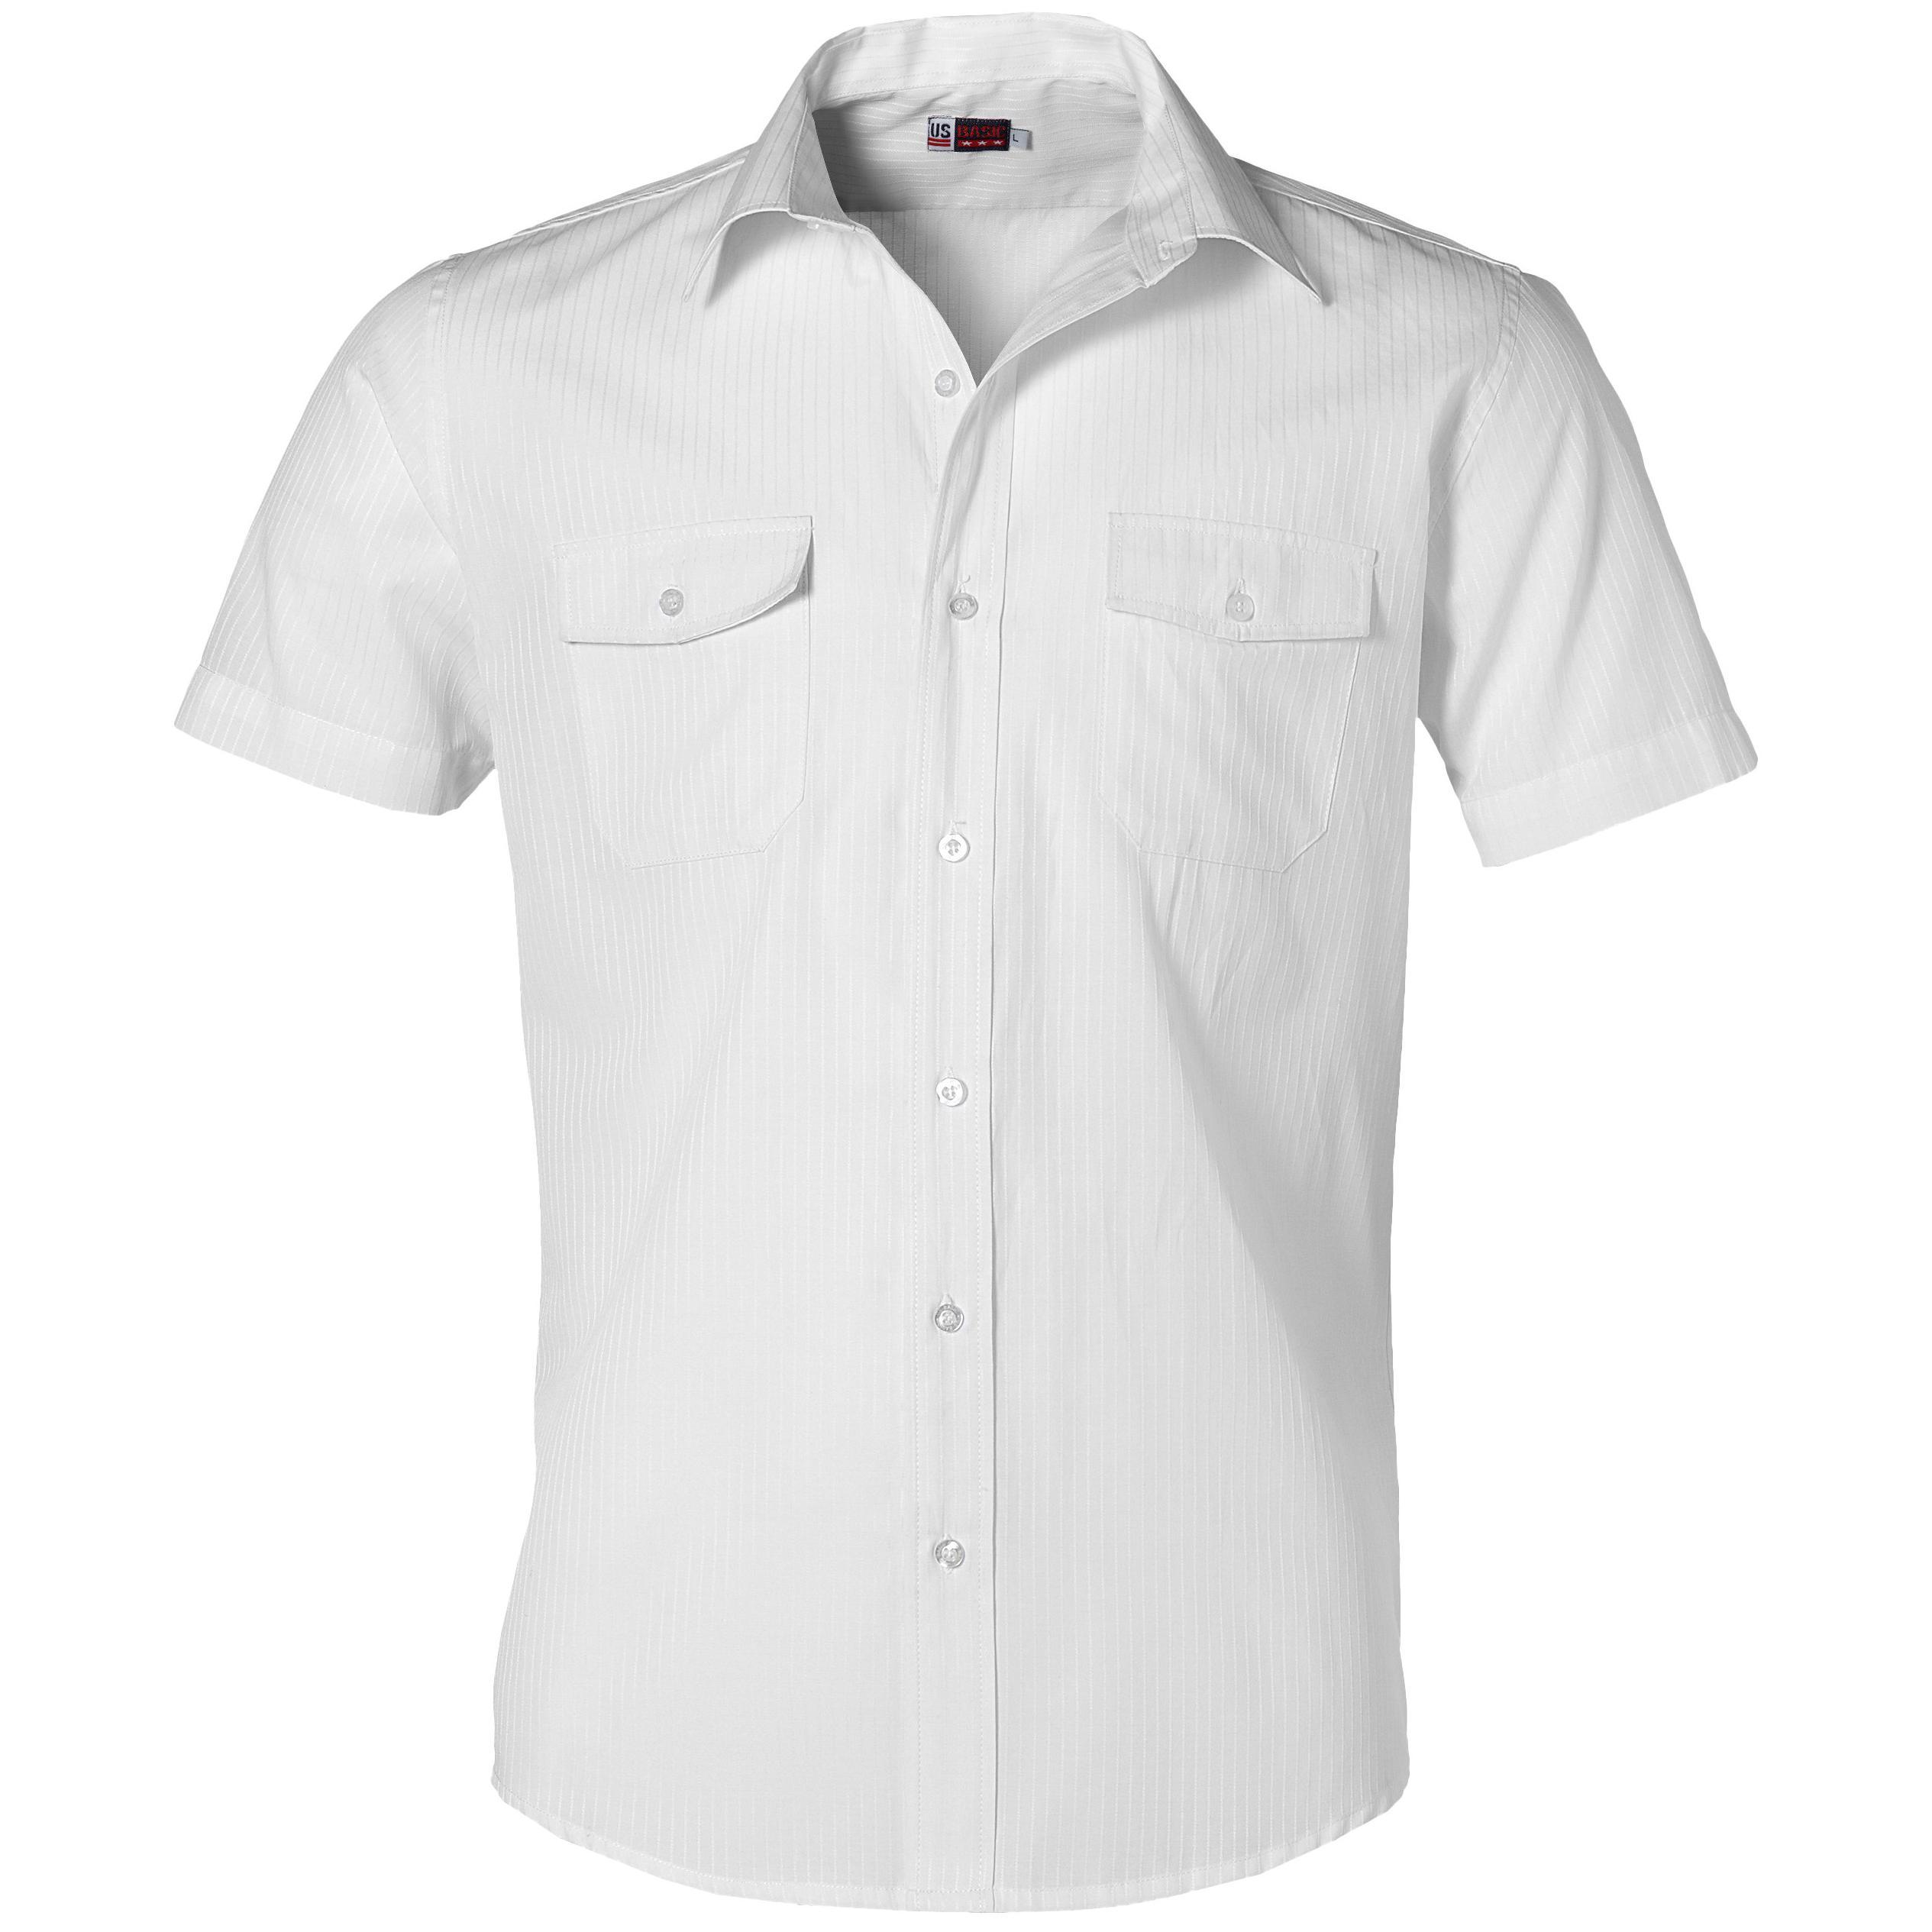 Mens Short Sleeve Bayport Shirt -white Only